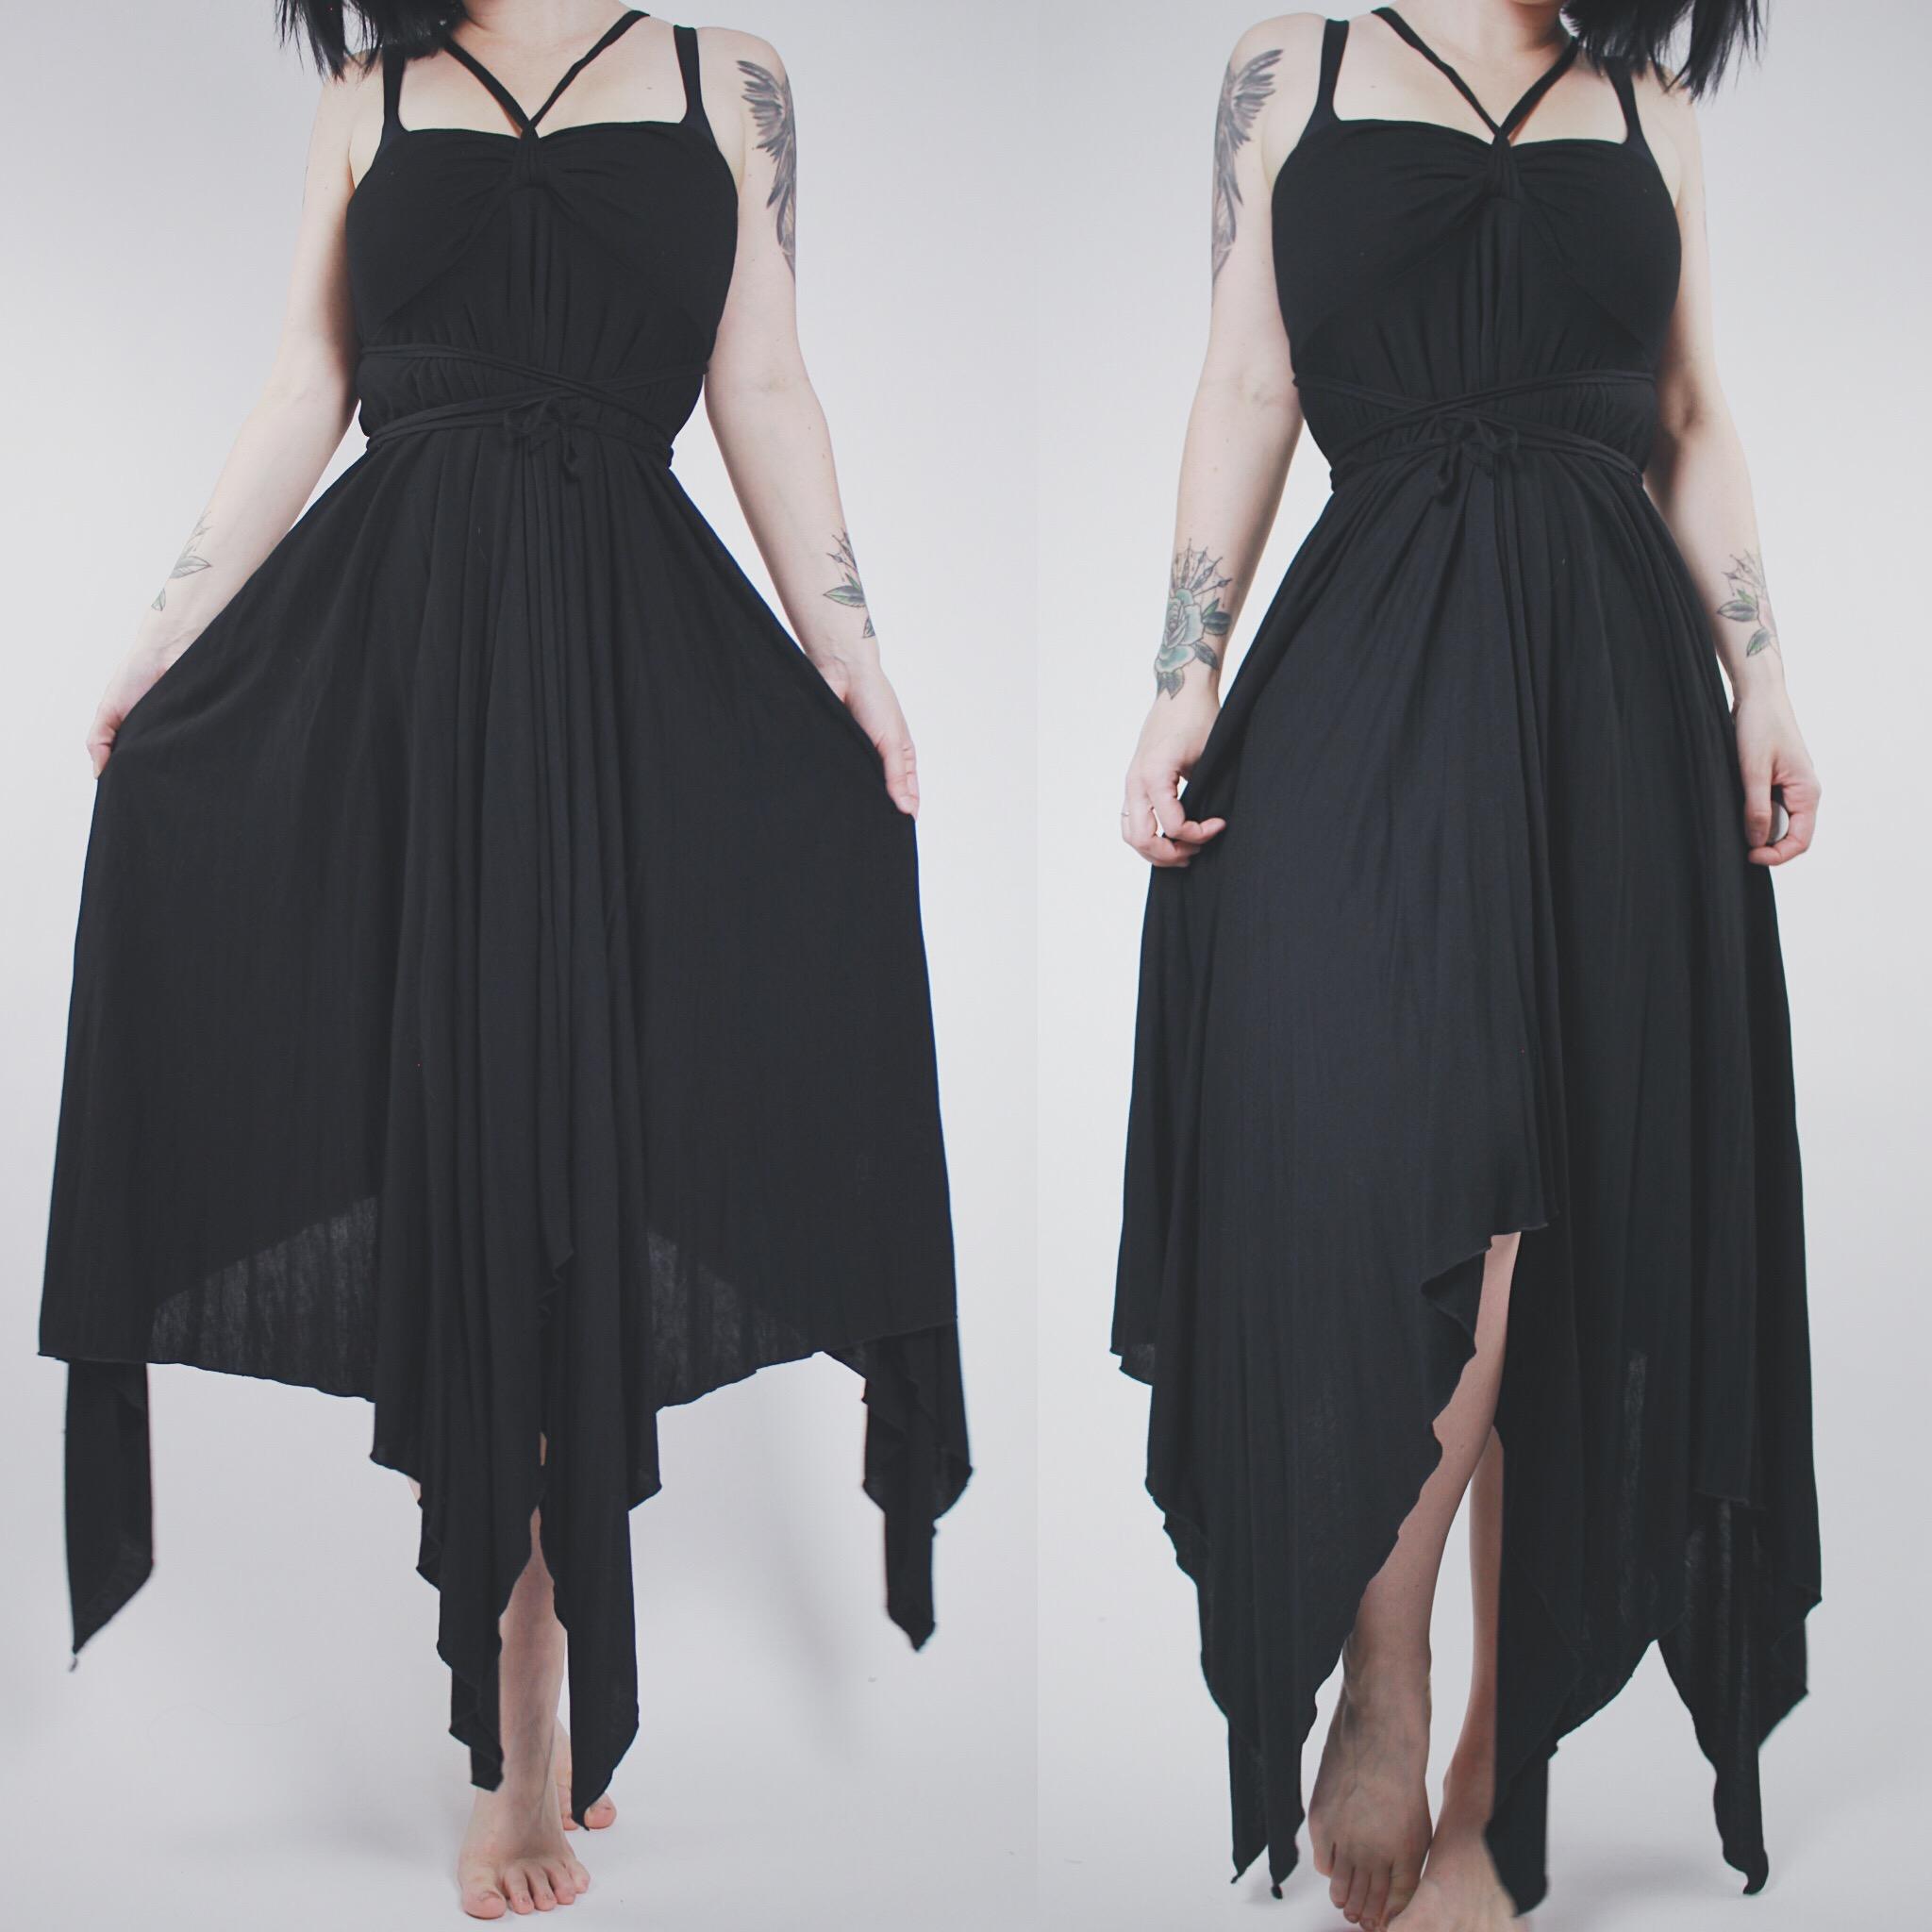 08143a7225 CLAIMED @vamps420 - Vintage 90s Black Multi-Way Strappy Asymmetrical Maxi  Dress - Thumbnail